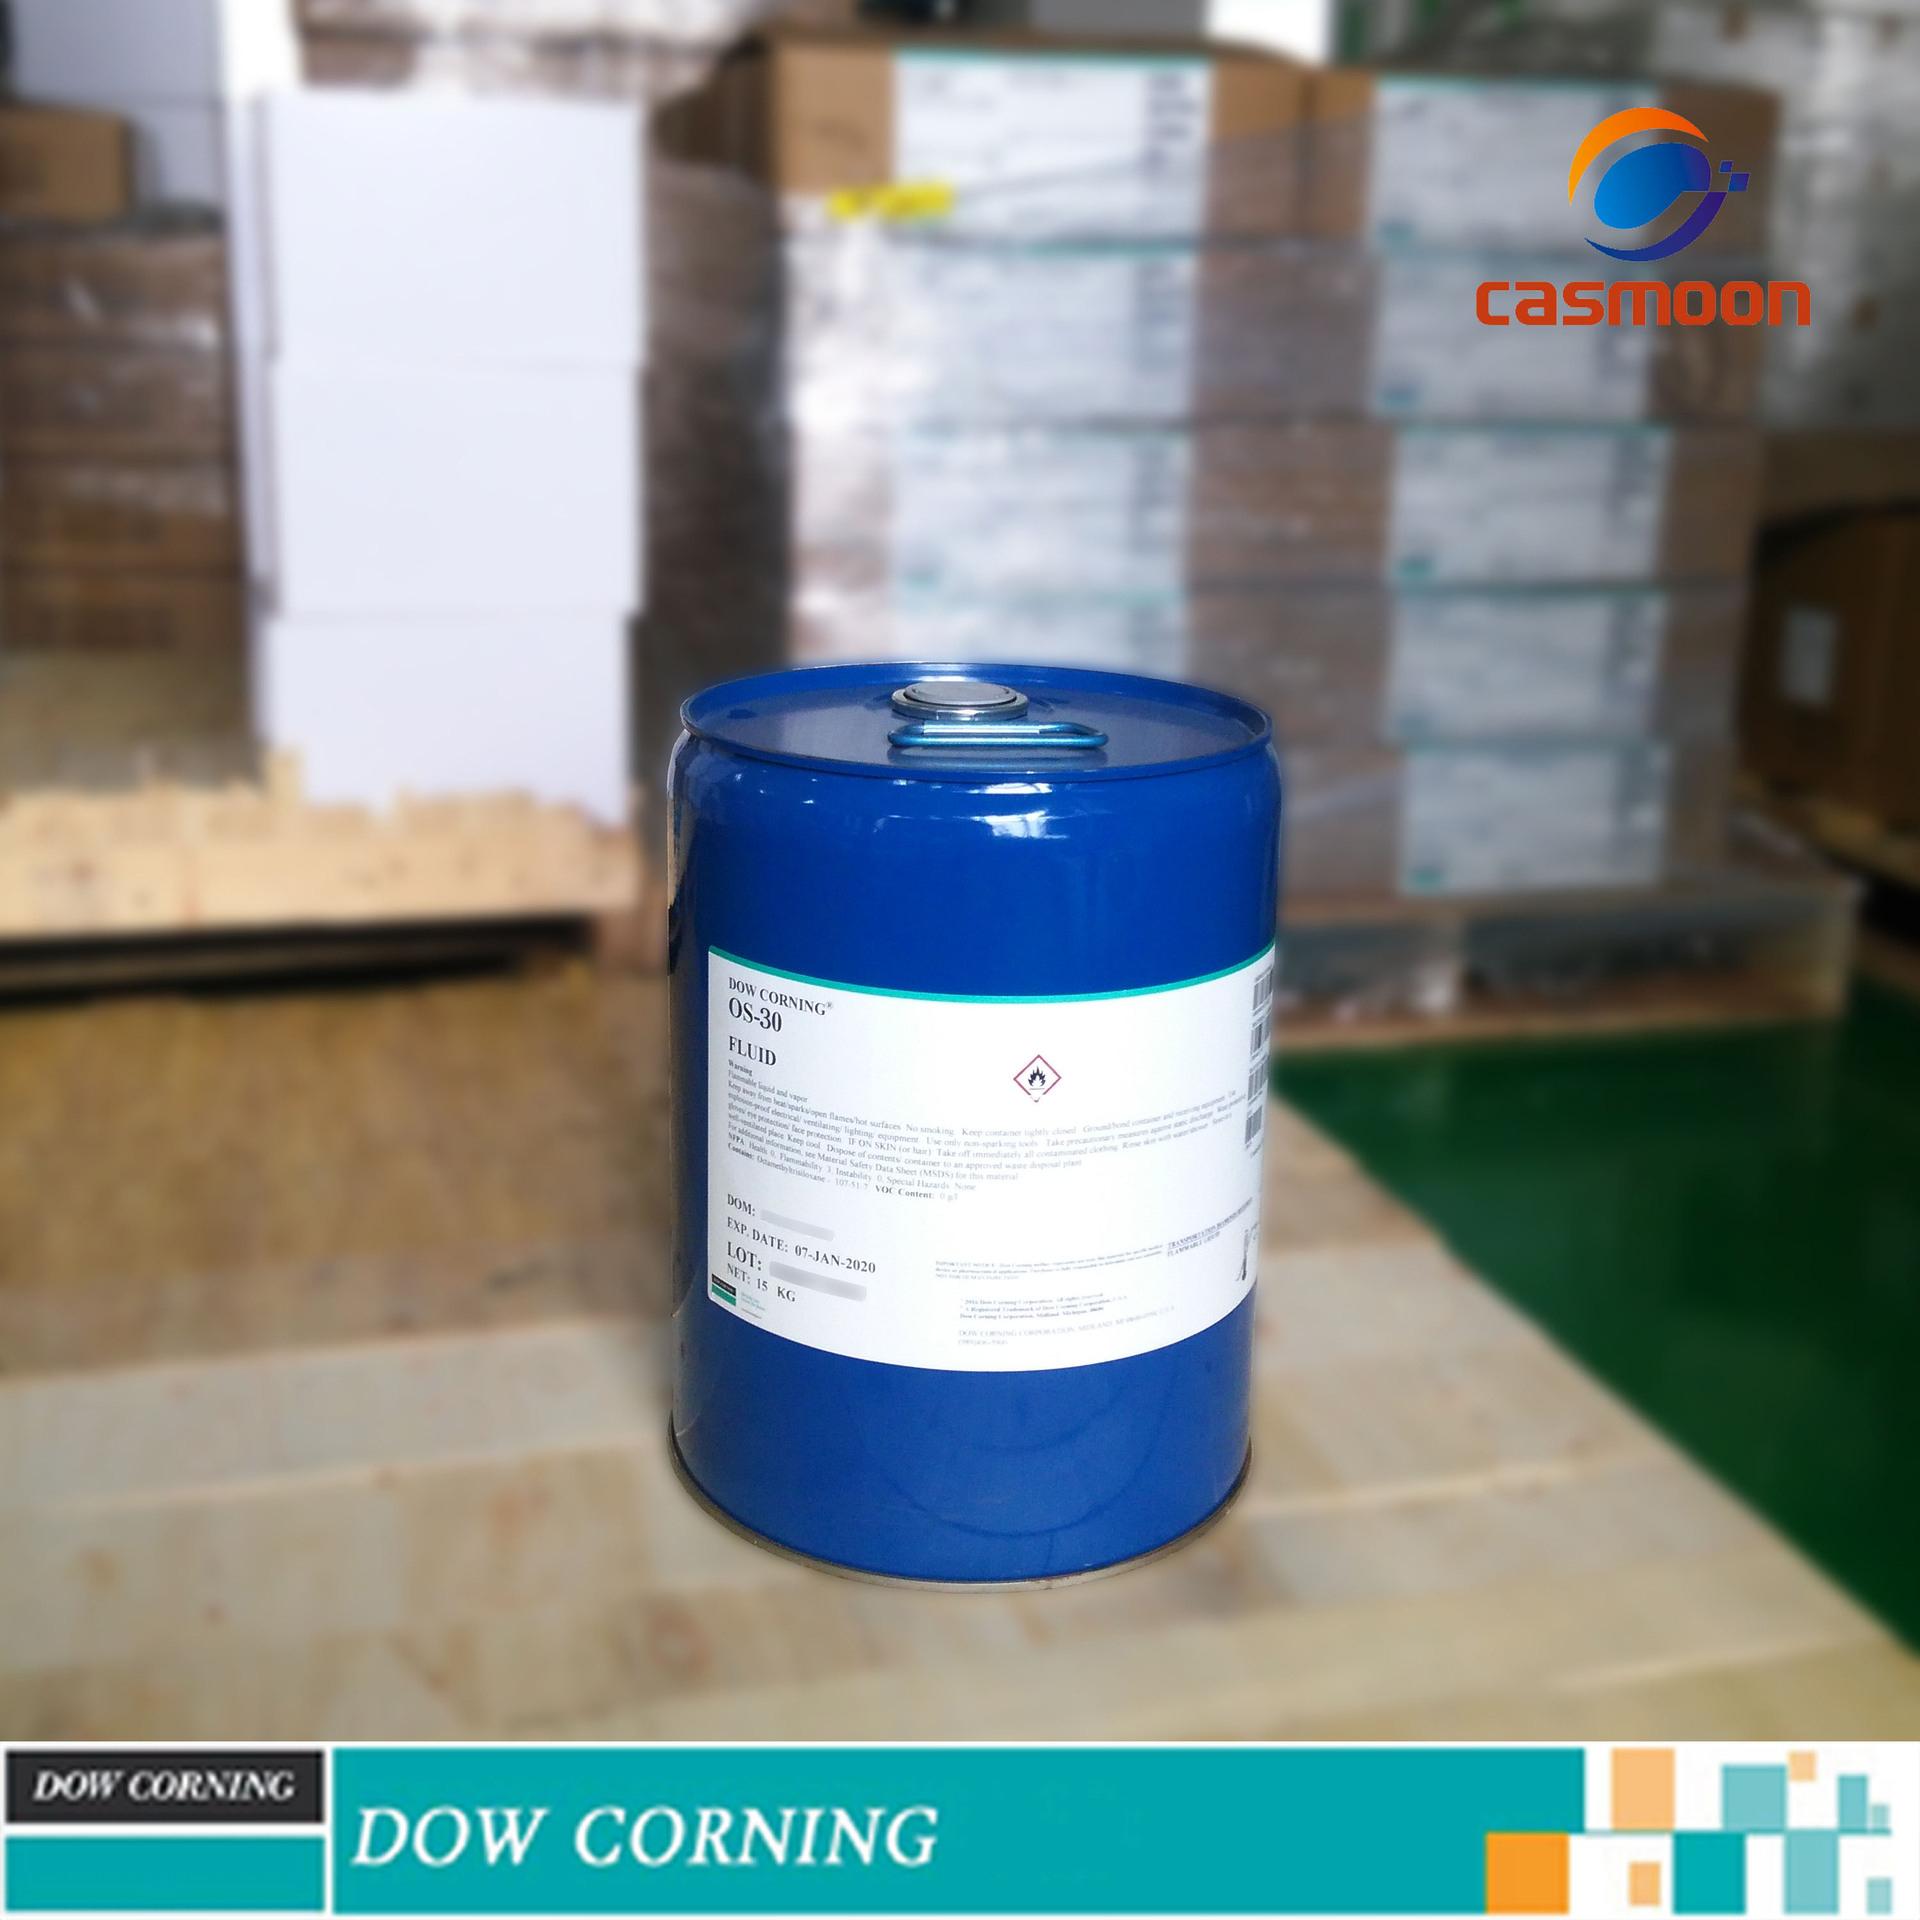 Keo dán tổng hợp  DOW CORNING/ OS-30 15kg/ silica diluent Dow Corning insulation glue barrel